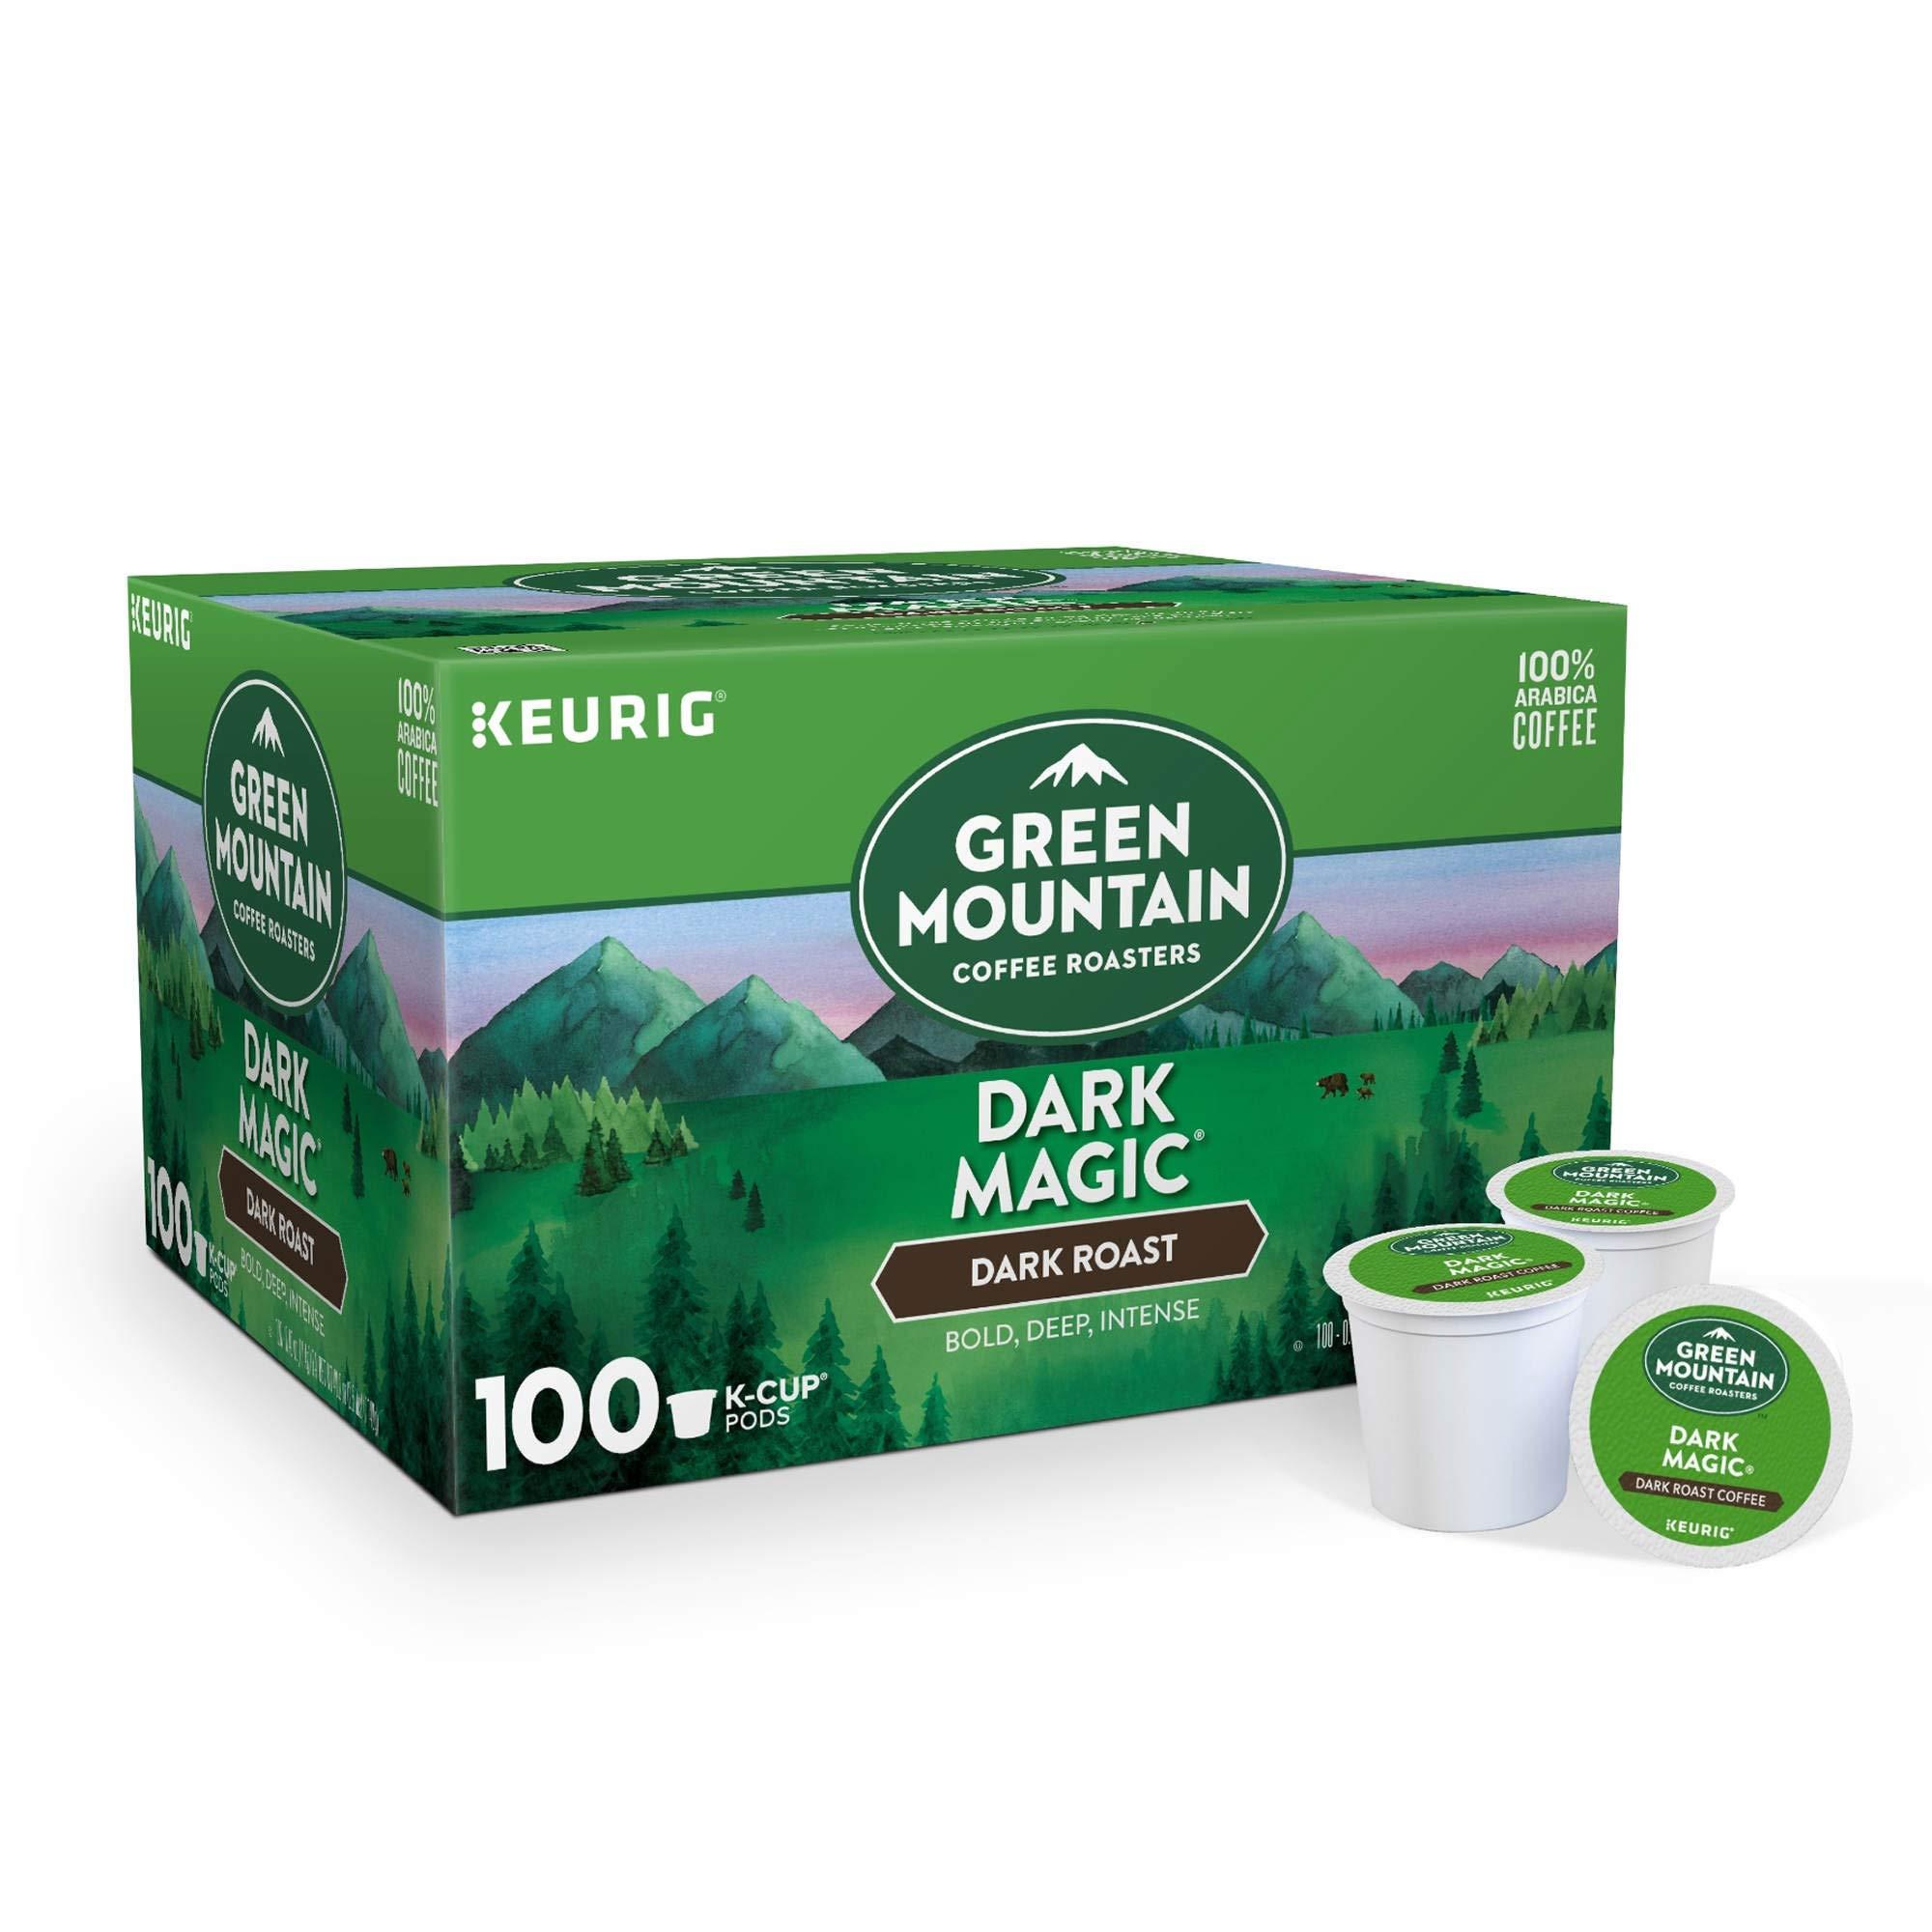 Green Mountain Coffee Roasters Keurig Single-Serve K-Cup pods, Dark Roast Coffee, 40.2 Ounce by Green Mountain Coffee Roasters